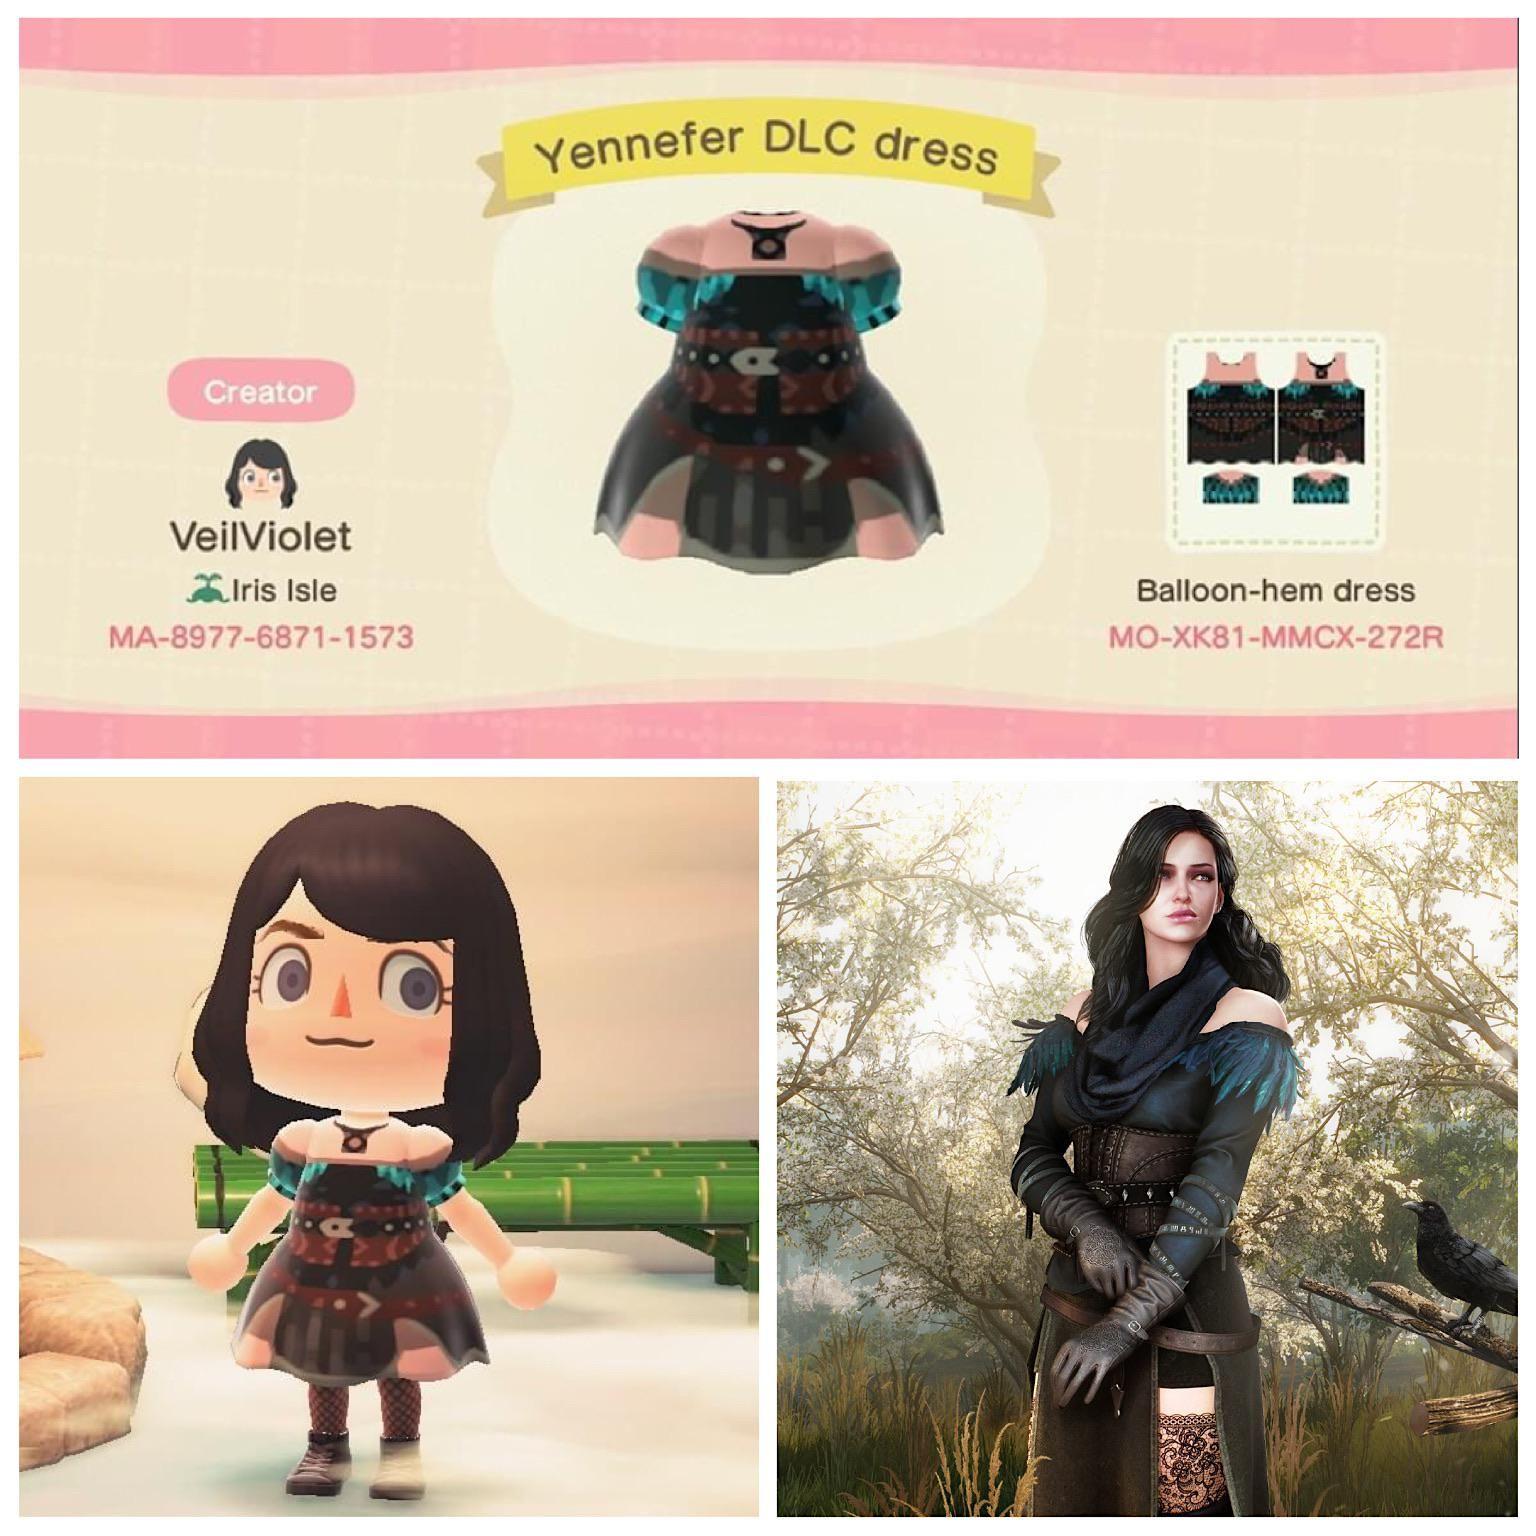 Acnh witcher 3 yennefer dlc dress by ufuzzygummybunny on